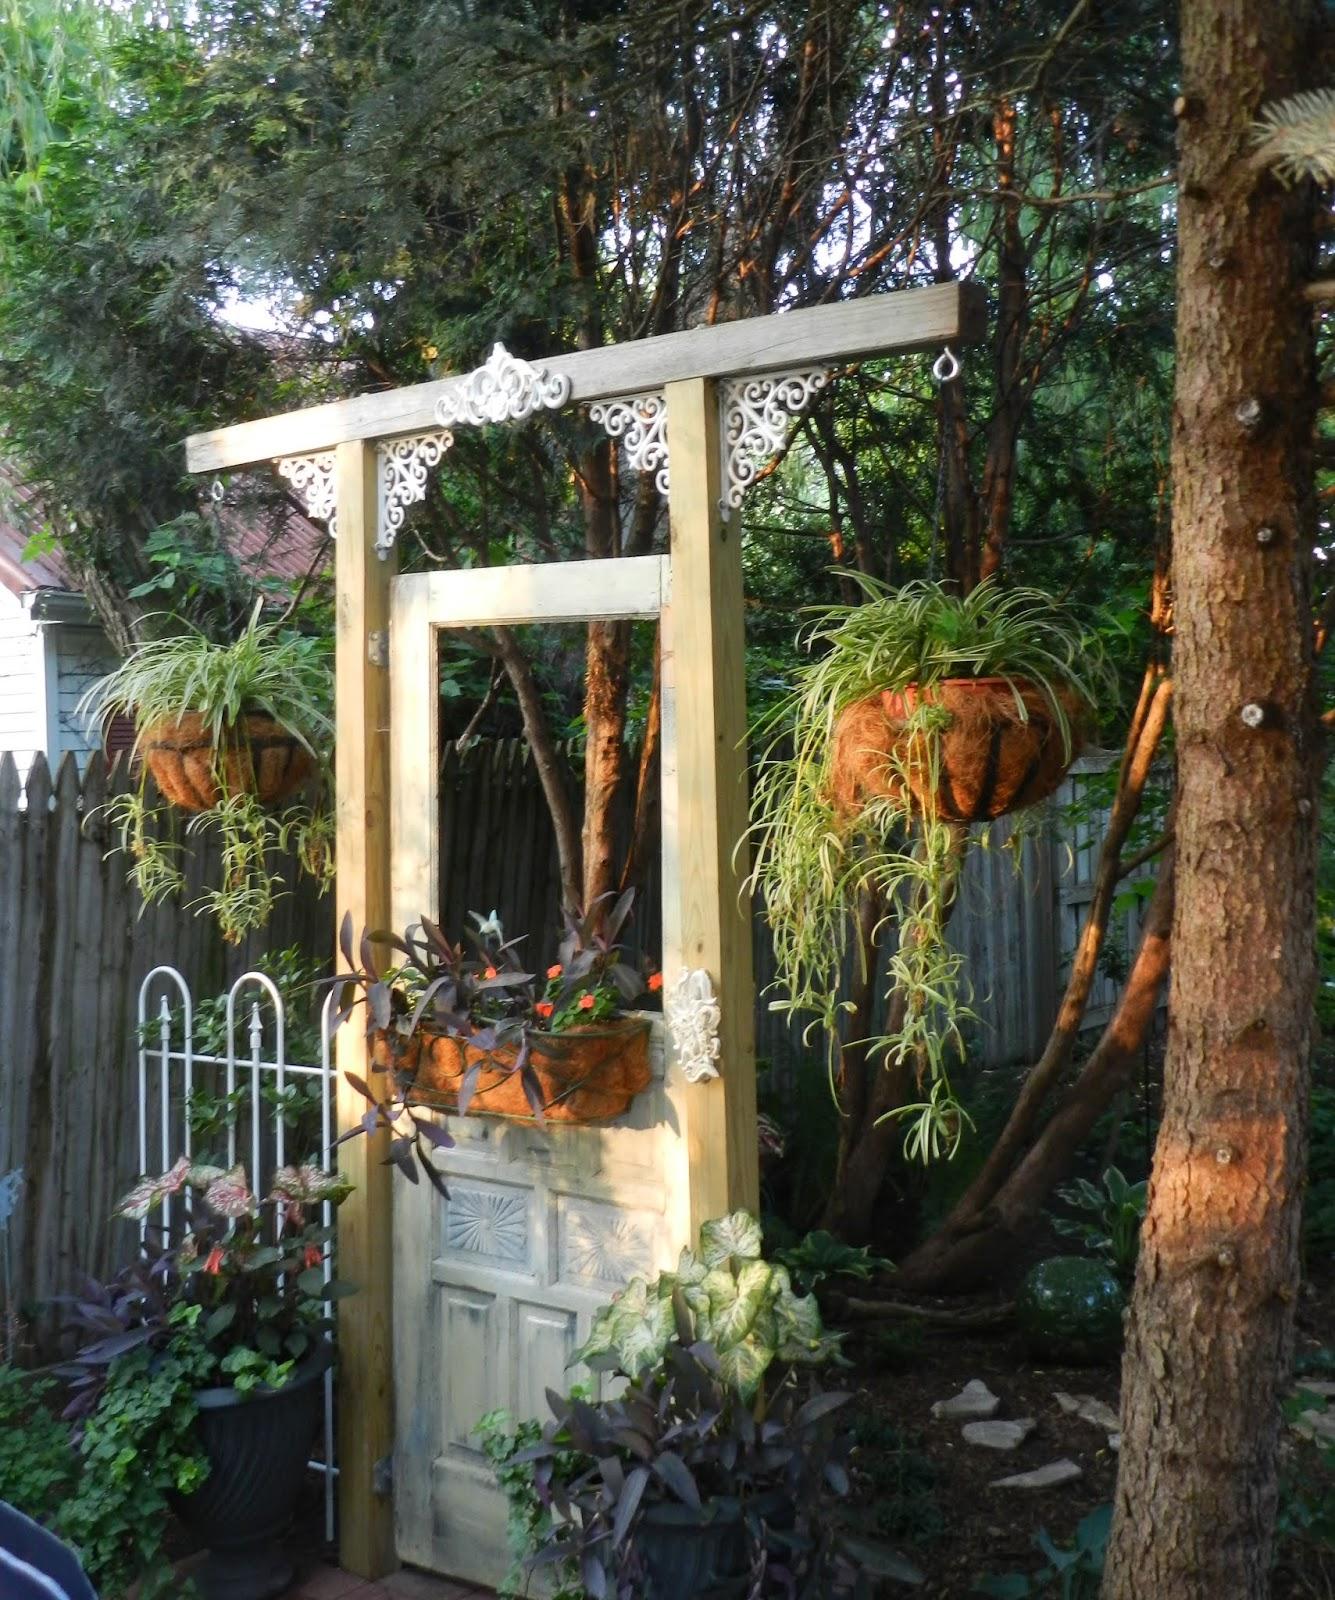 Prairie Rose's Garden: June Bloom Day on